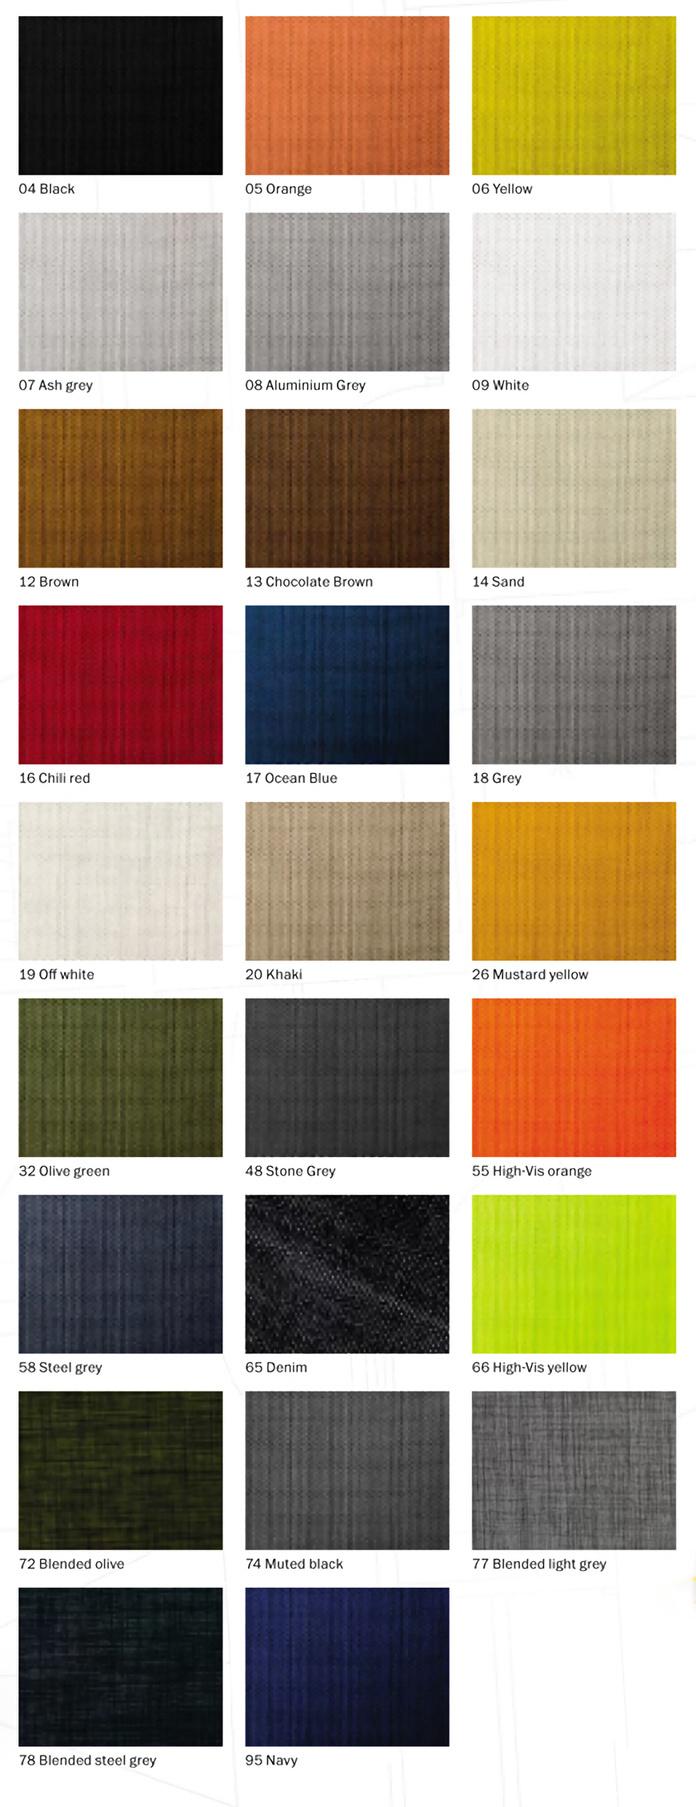 snickers workwear kleurcodes